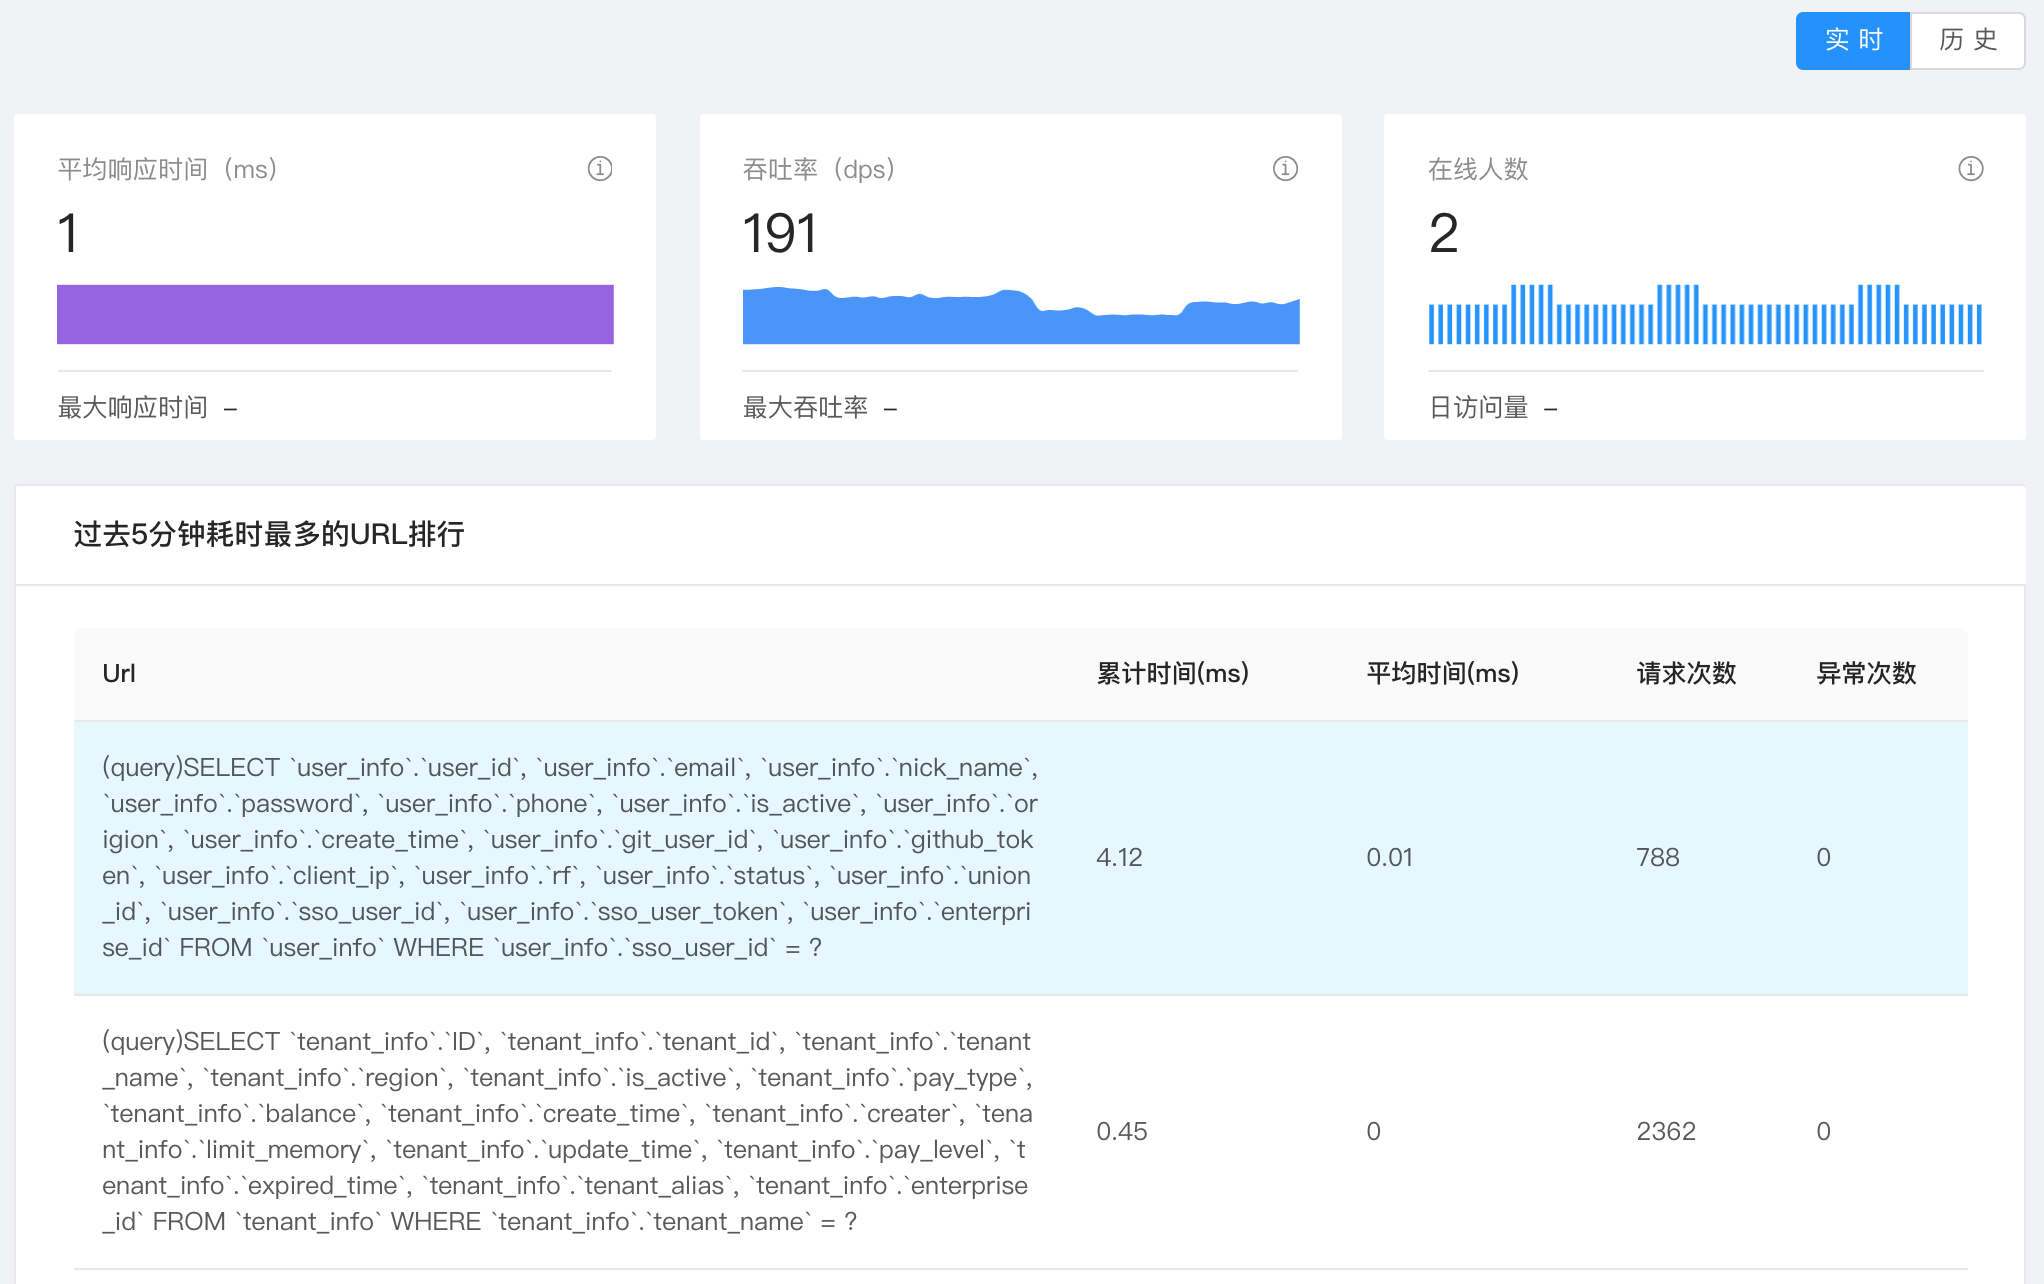 rainbond_service_mesh_monitor